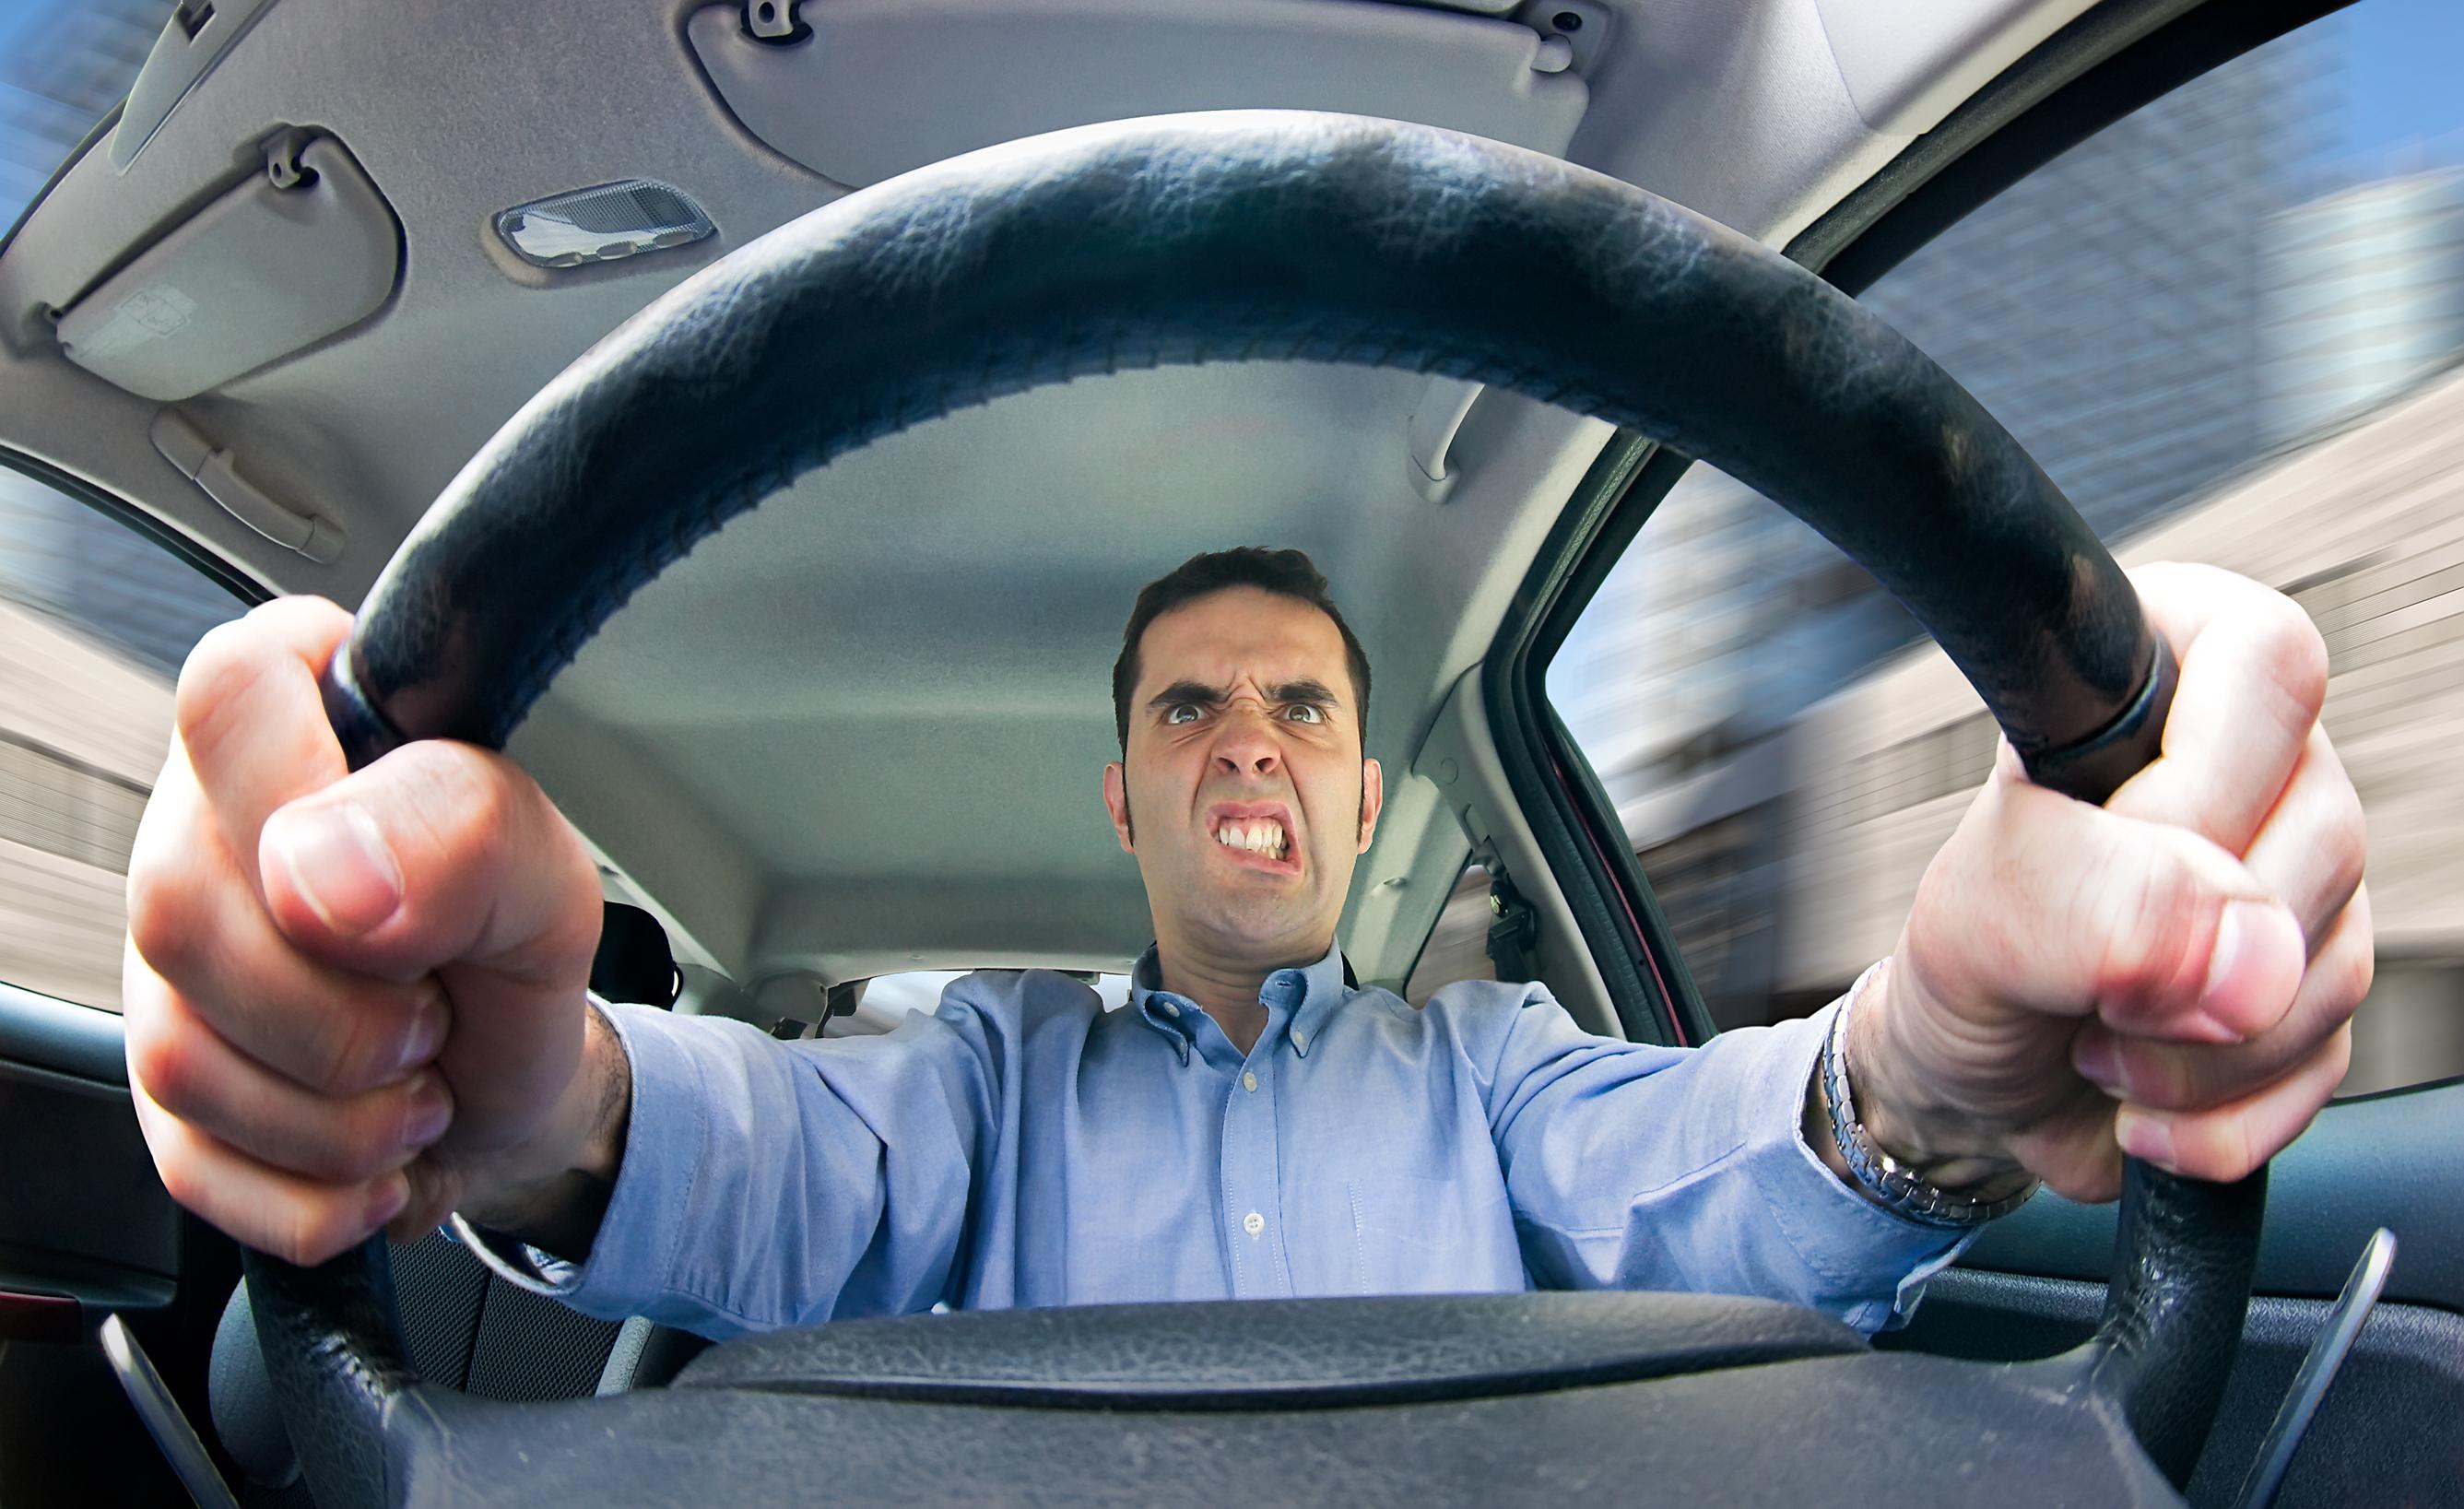 Poor driving etiquette